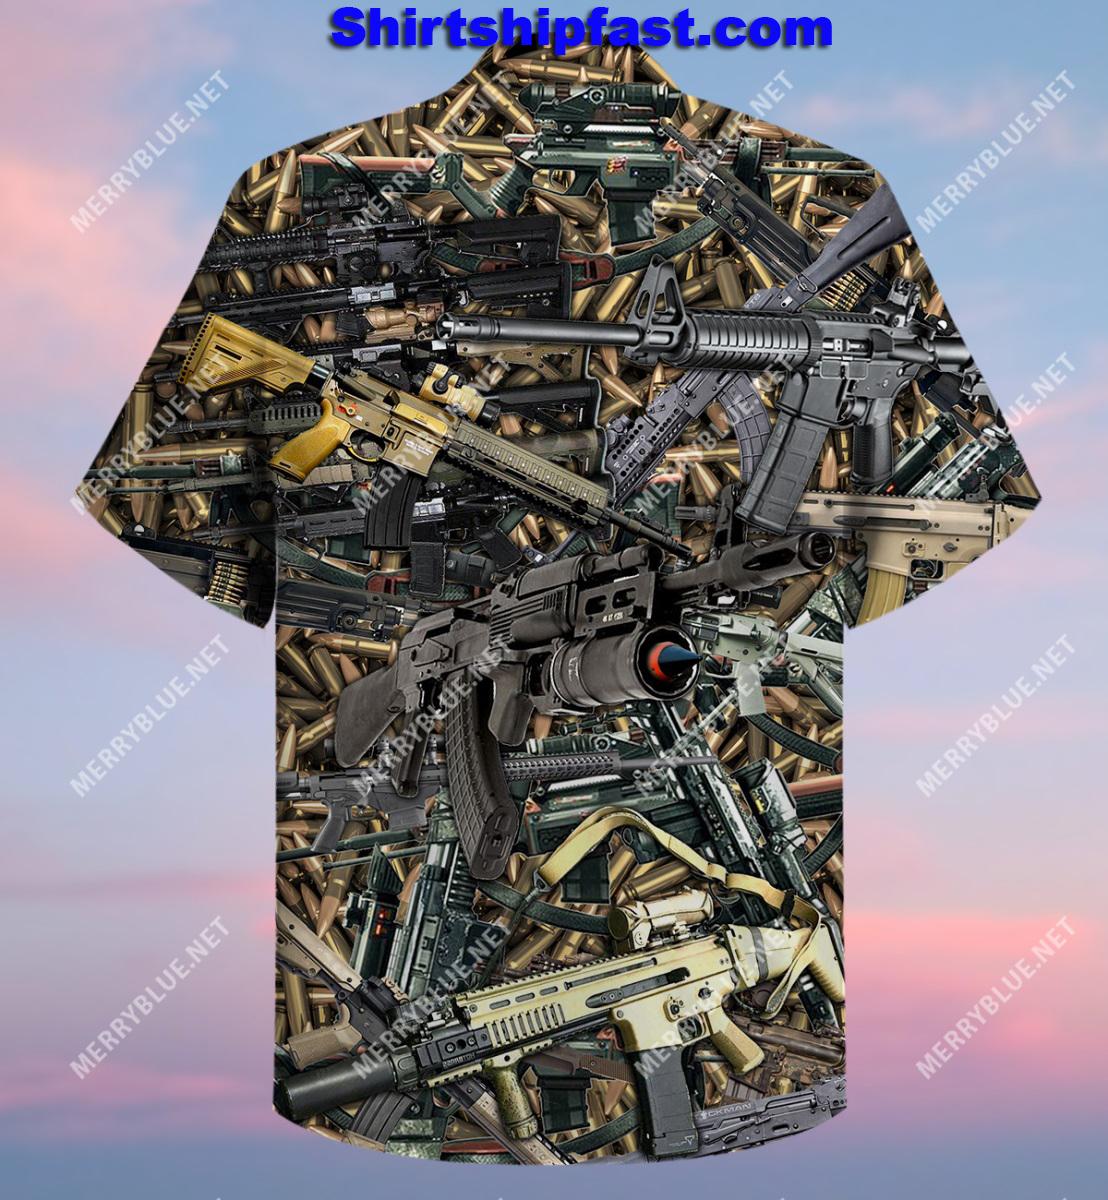 The quickest way to a man's heart is 2970 feet per second hawaiian shirt and short sleeve shirt